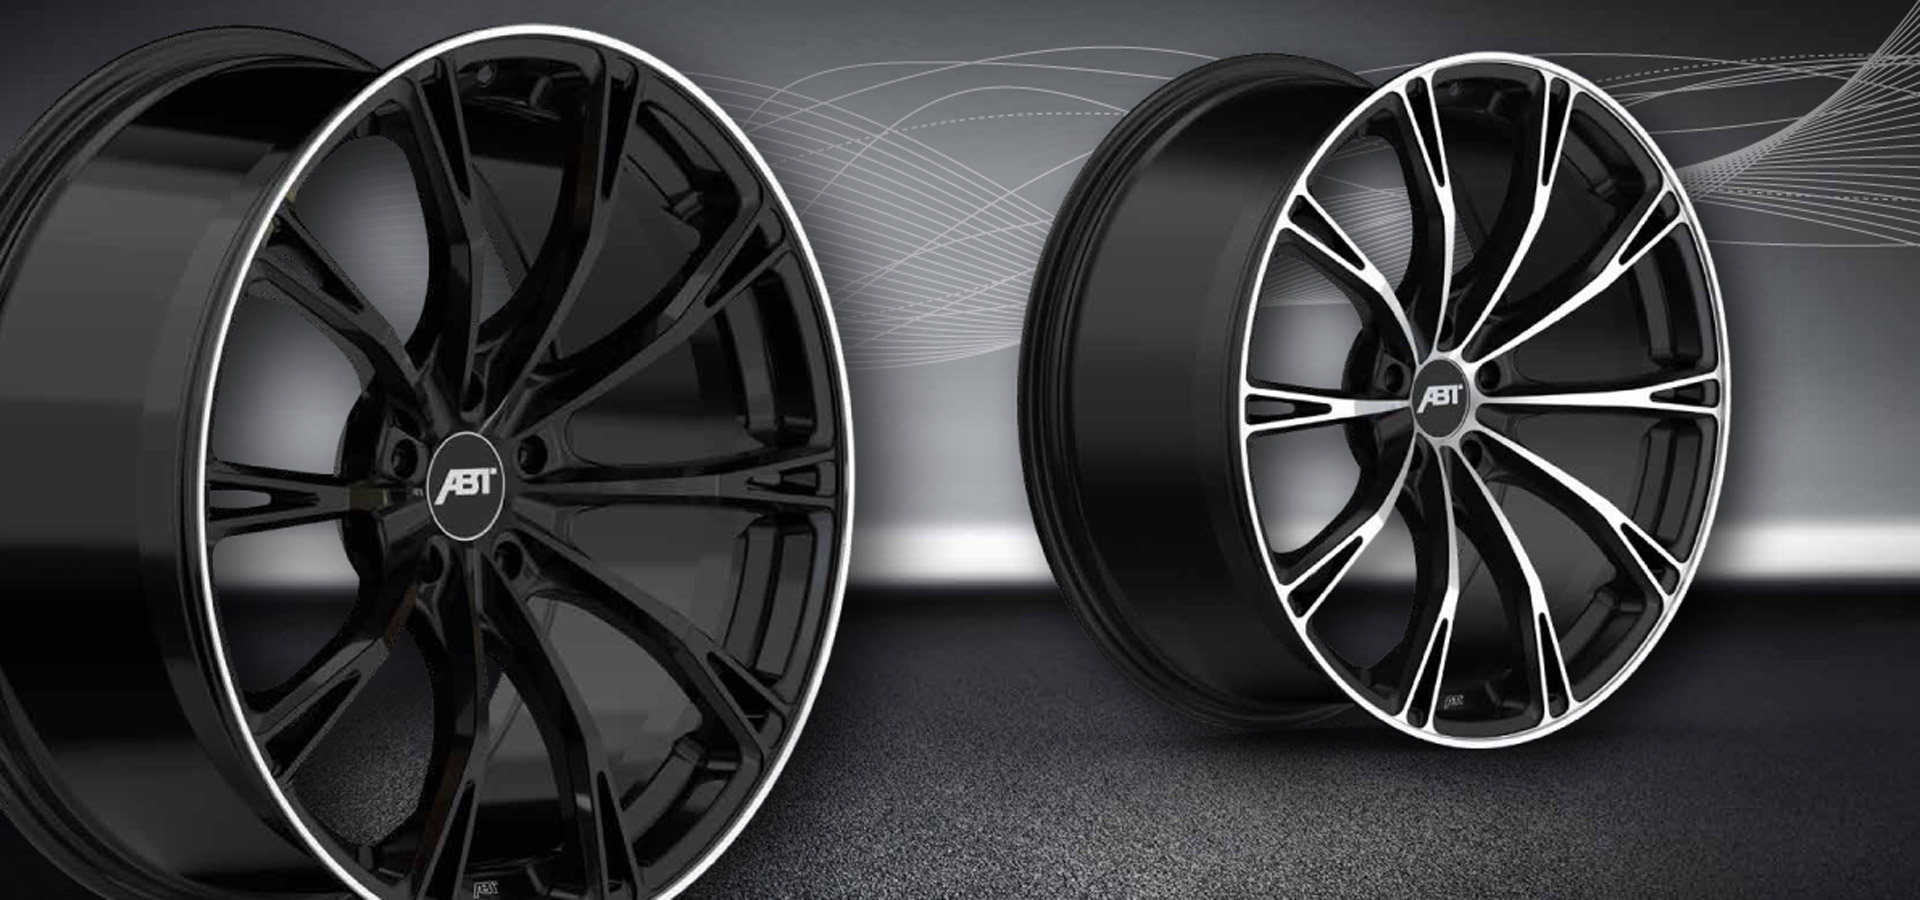 ABT Wheels